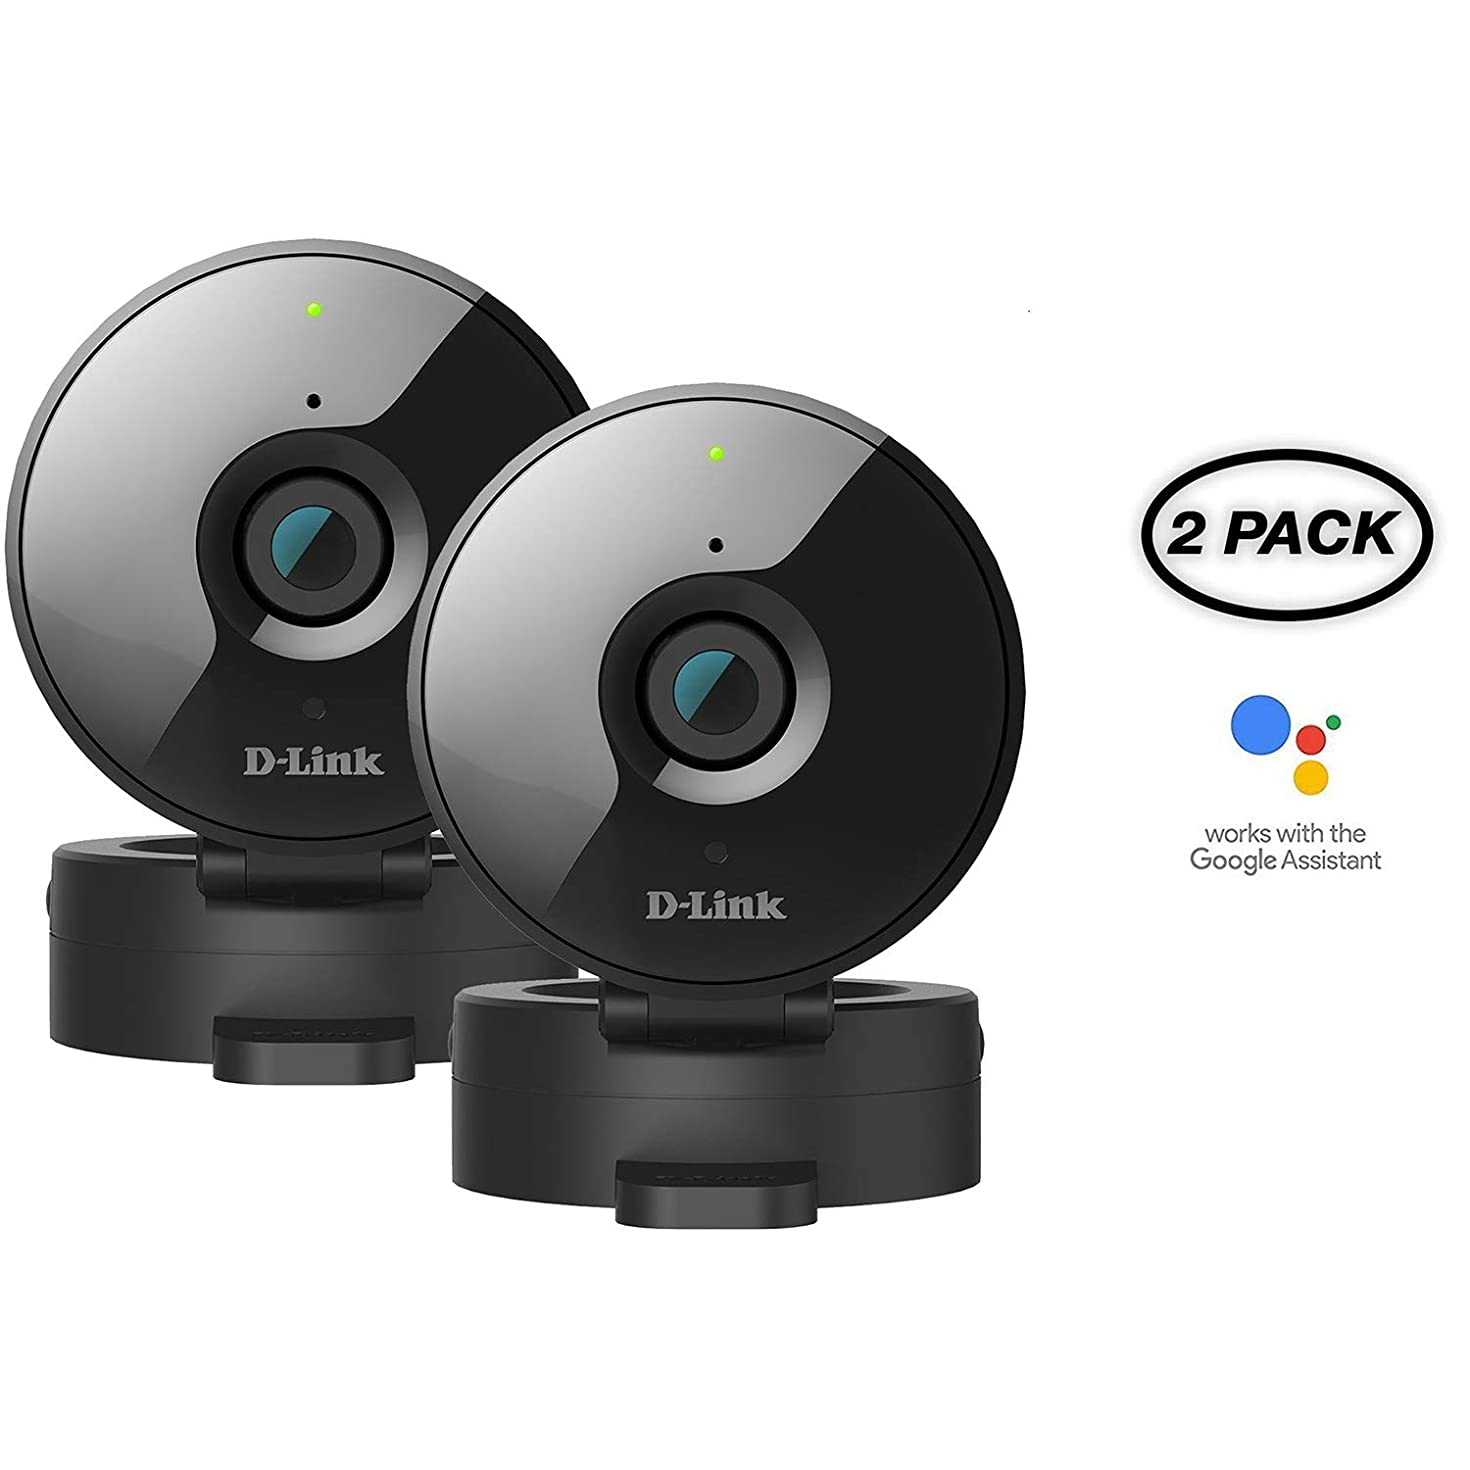 D-Link 2-Pack Wireless-N Network Surveillance 720P Home Internet Camera DCS-936L (Renewed)